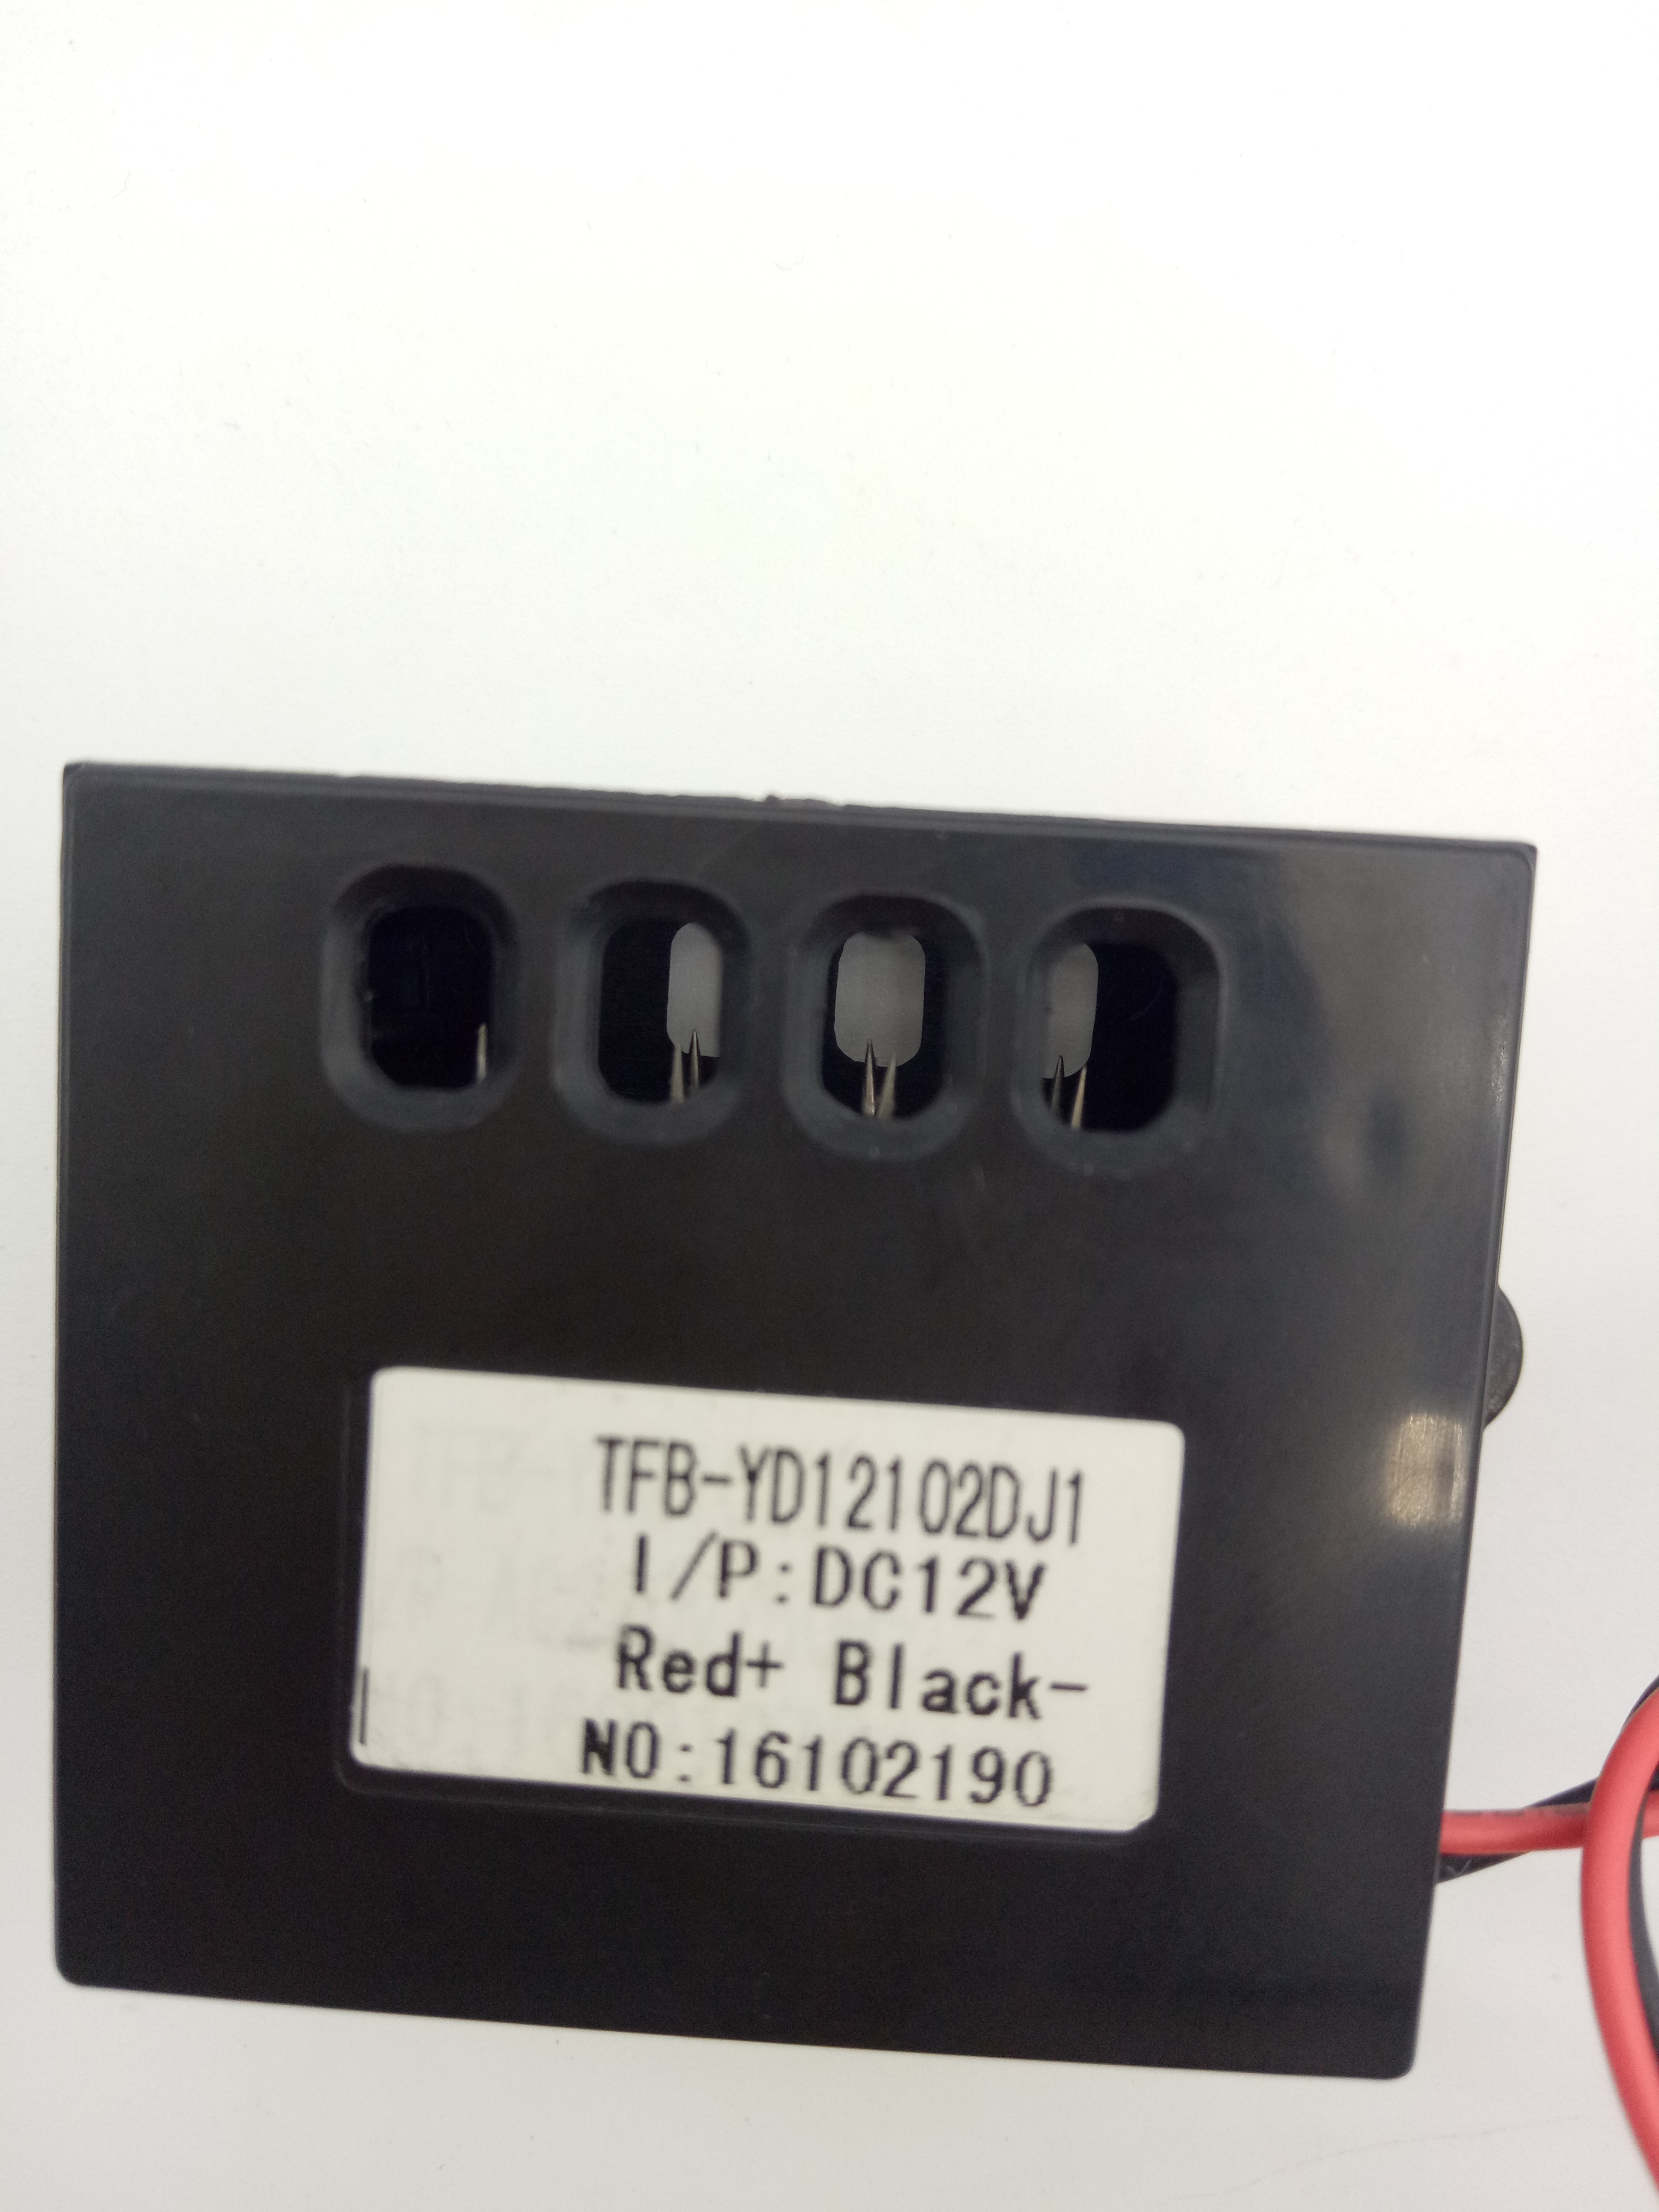 TFB-YD12102DJ1 plasma positive and negative ion generator refrigerator keep fresh